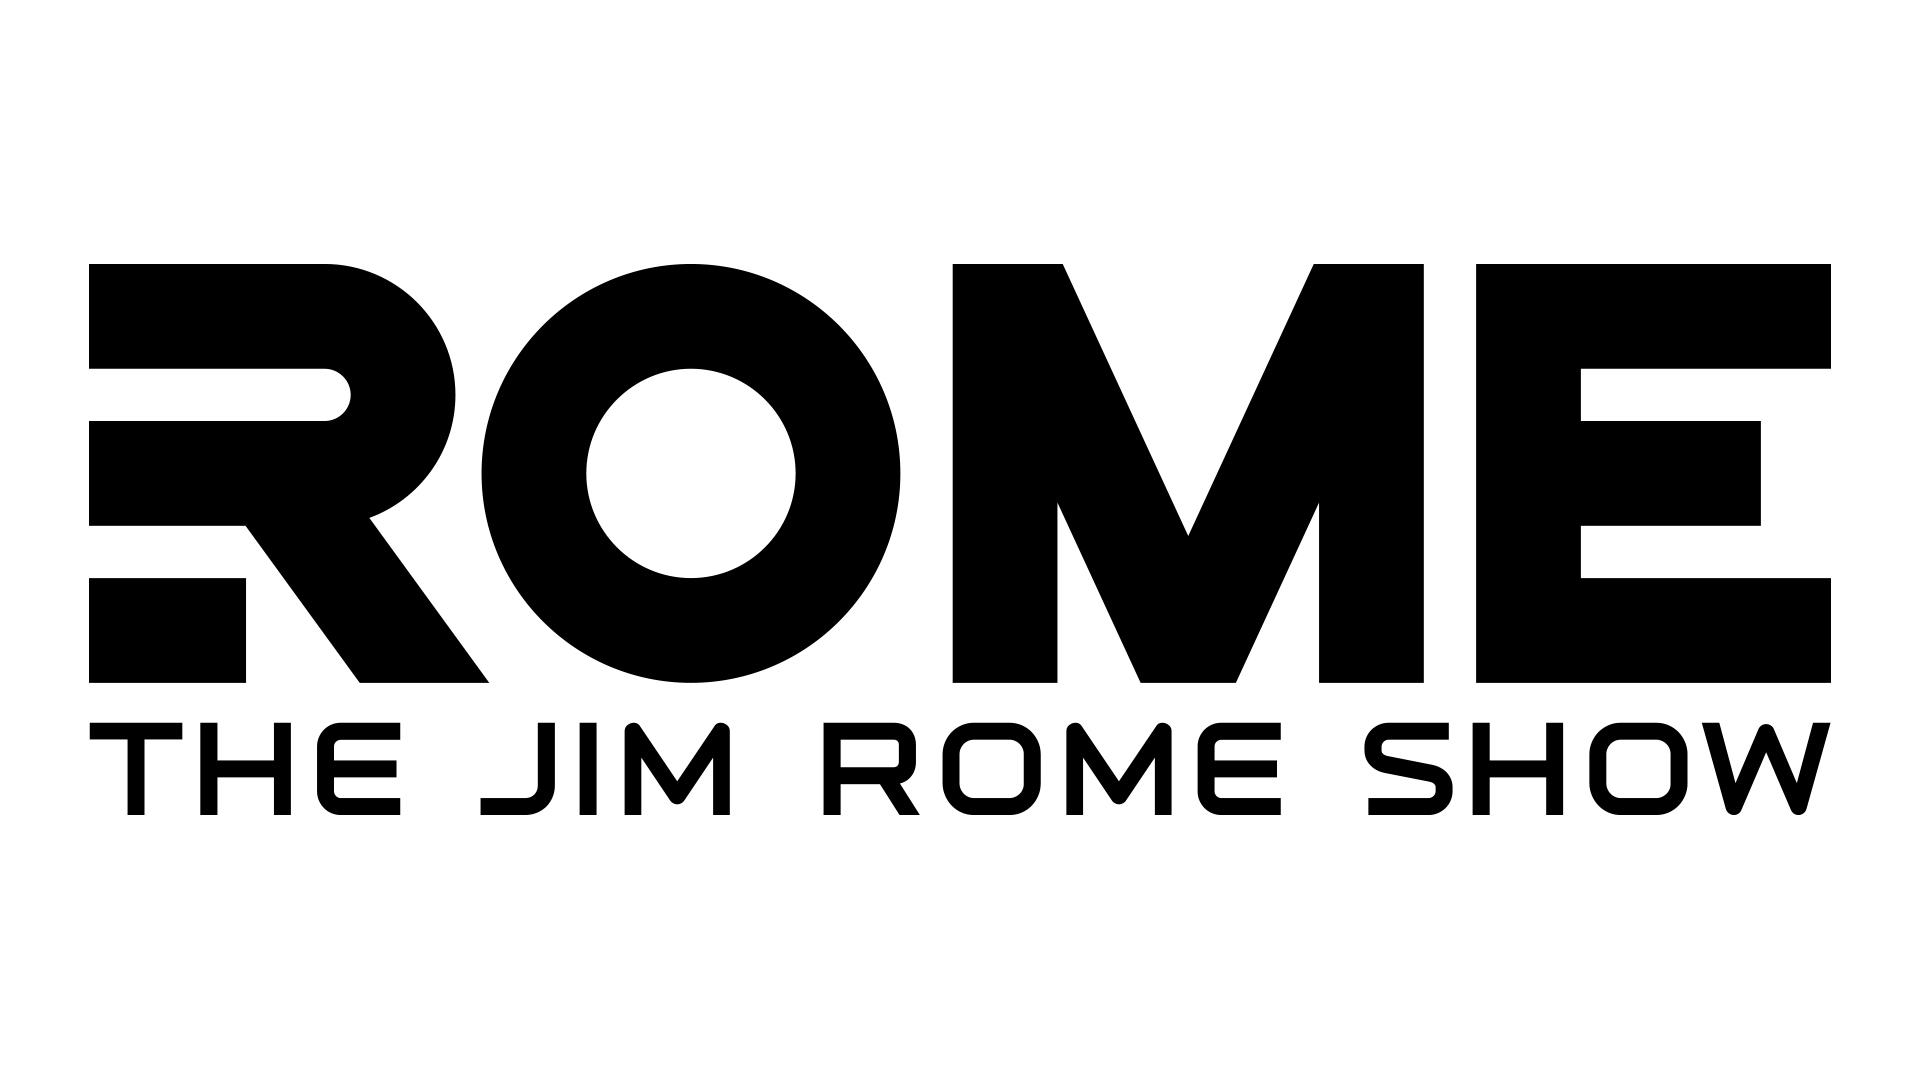 Cbs Sports Network Will Televise Jim Rome S Radio Show Variety